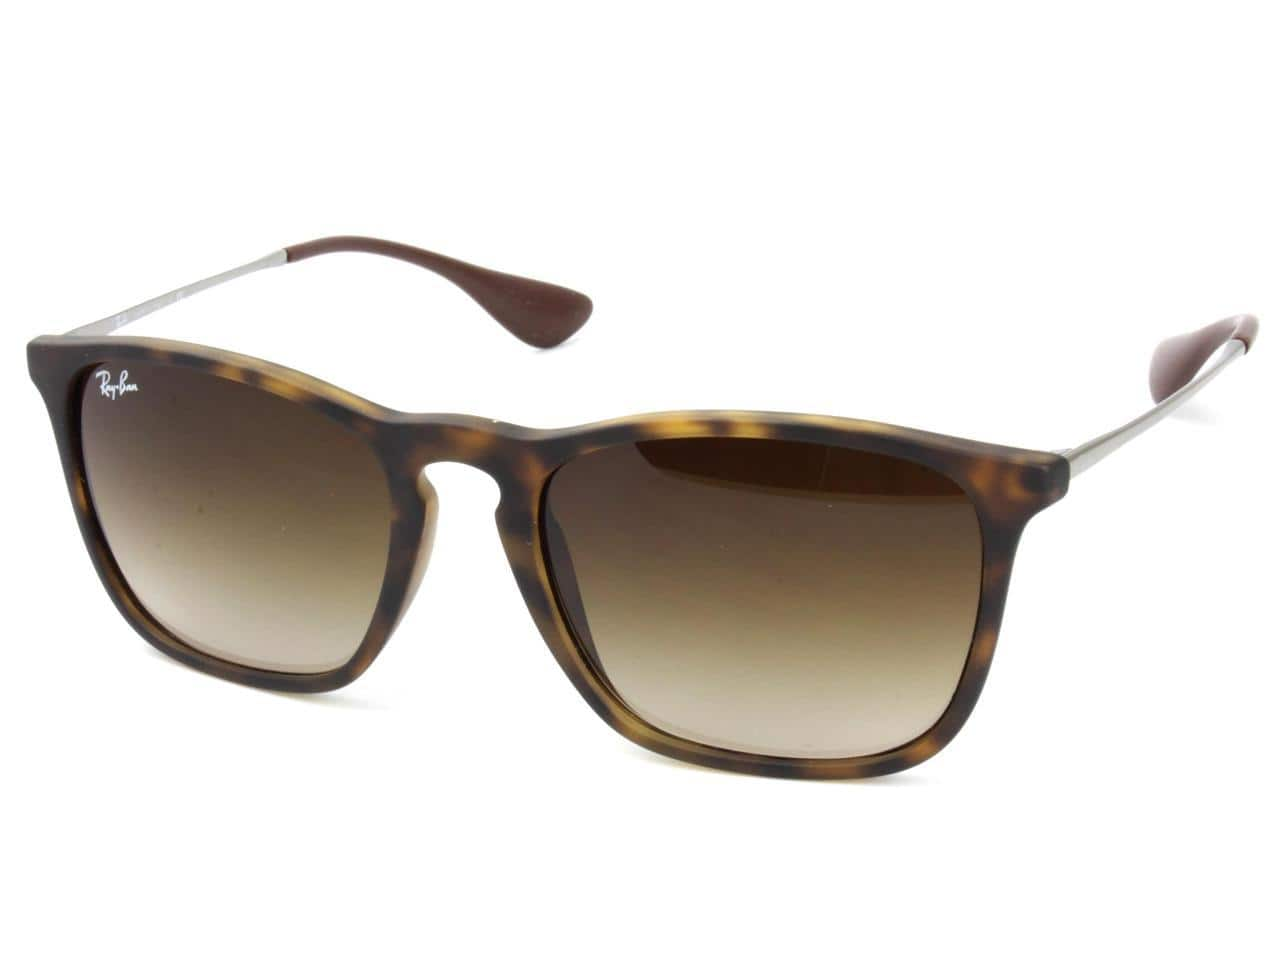 RAY BAN Sunglasses RB4187 856/13 Havana 54MM - $55.99 + FS